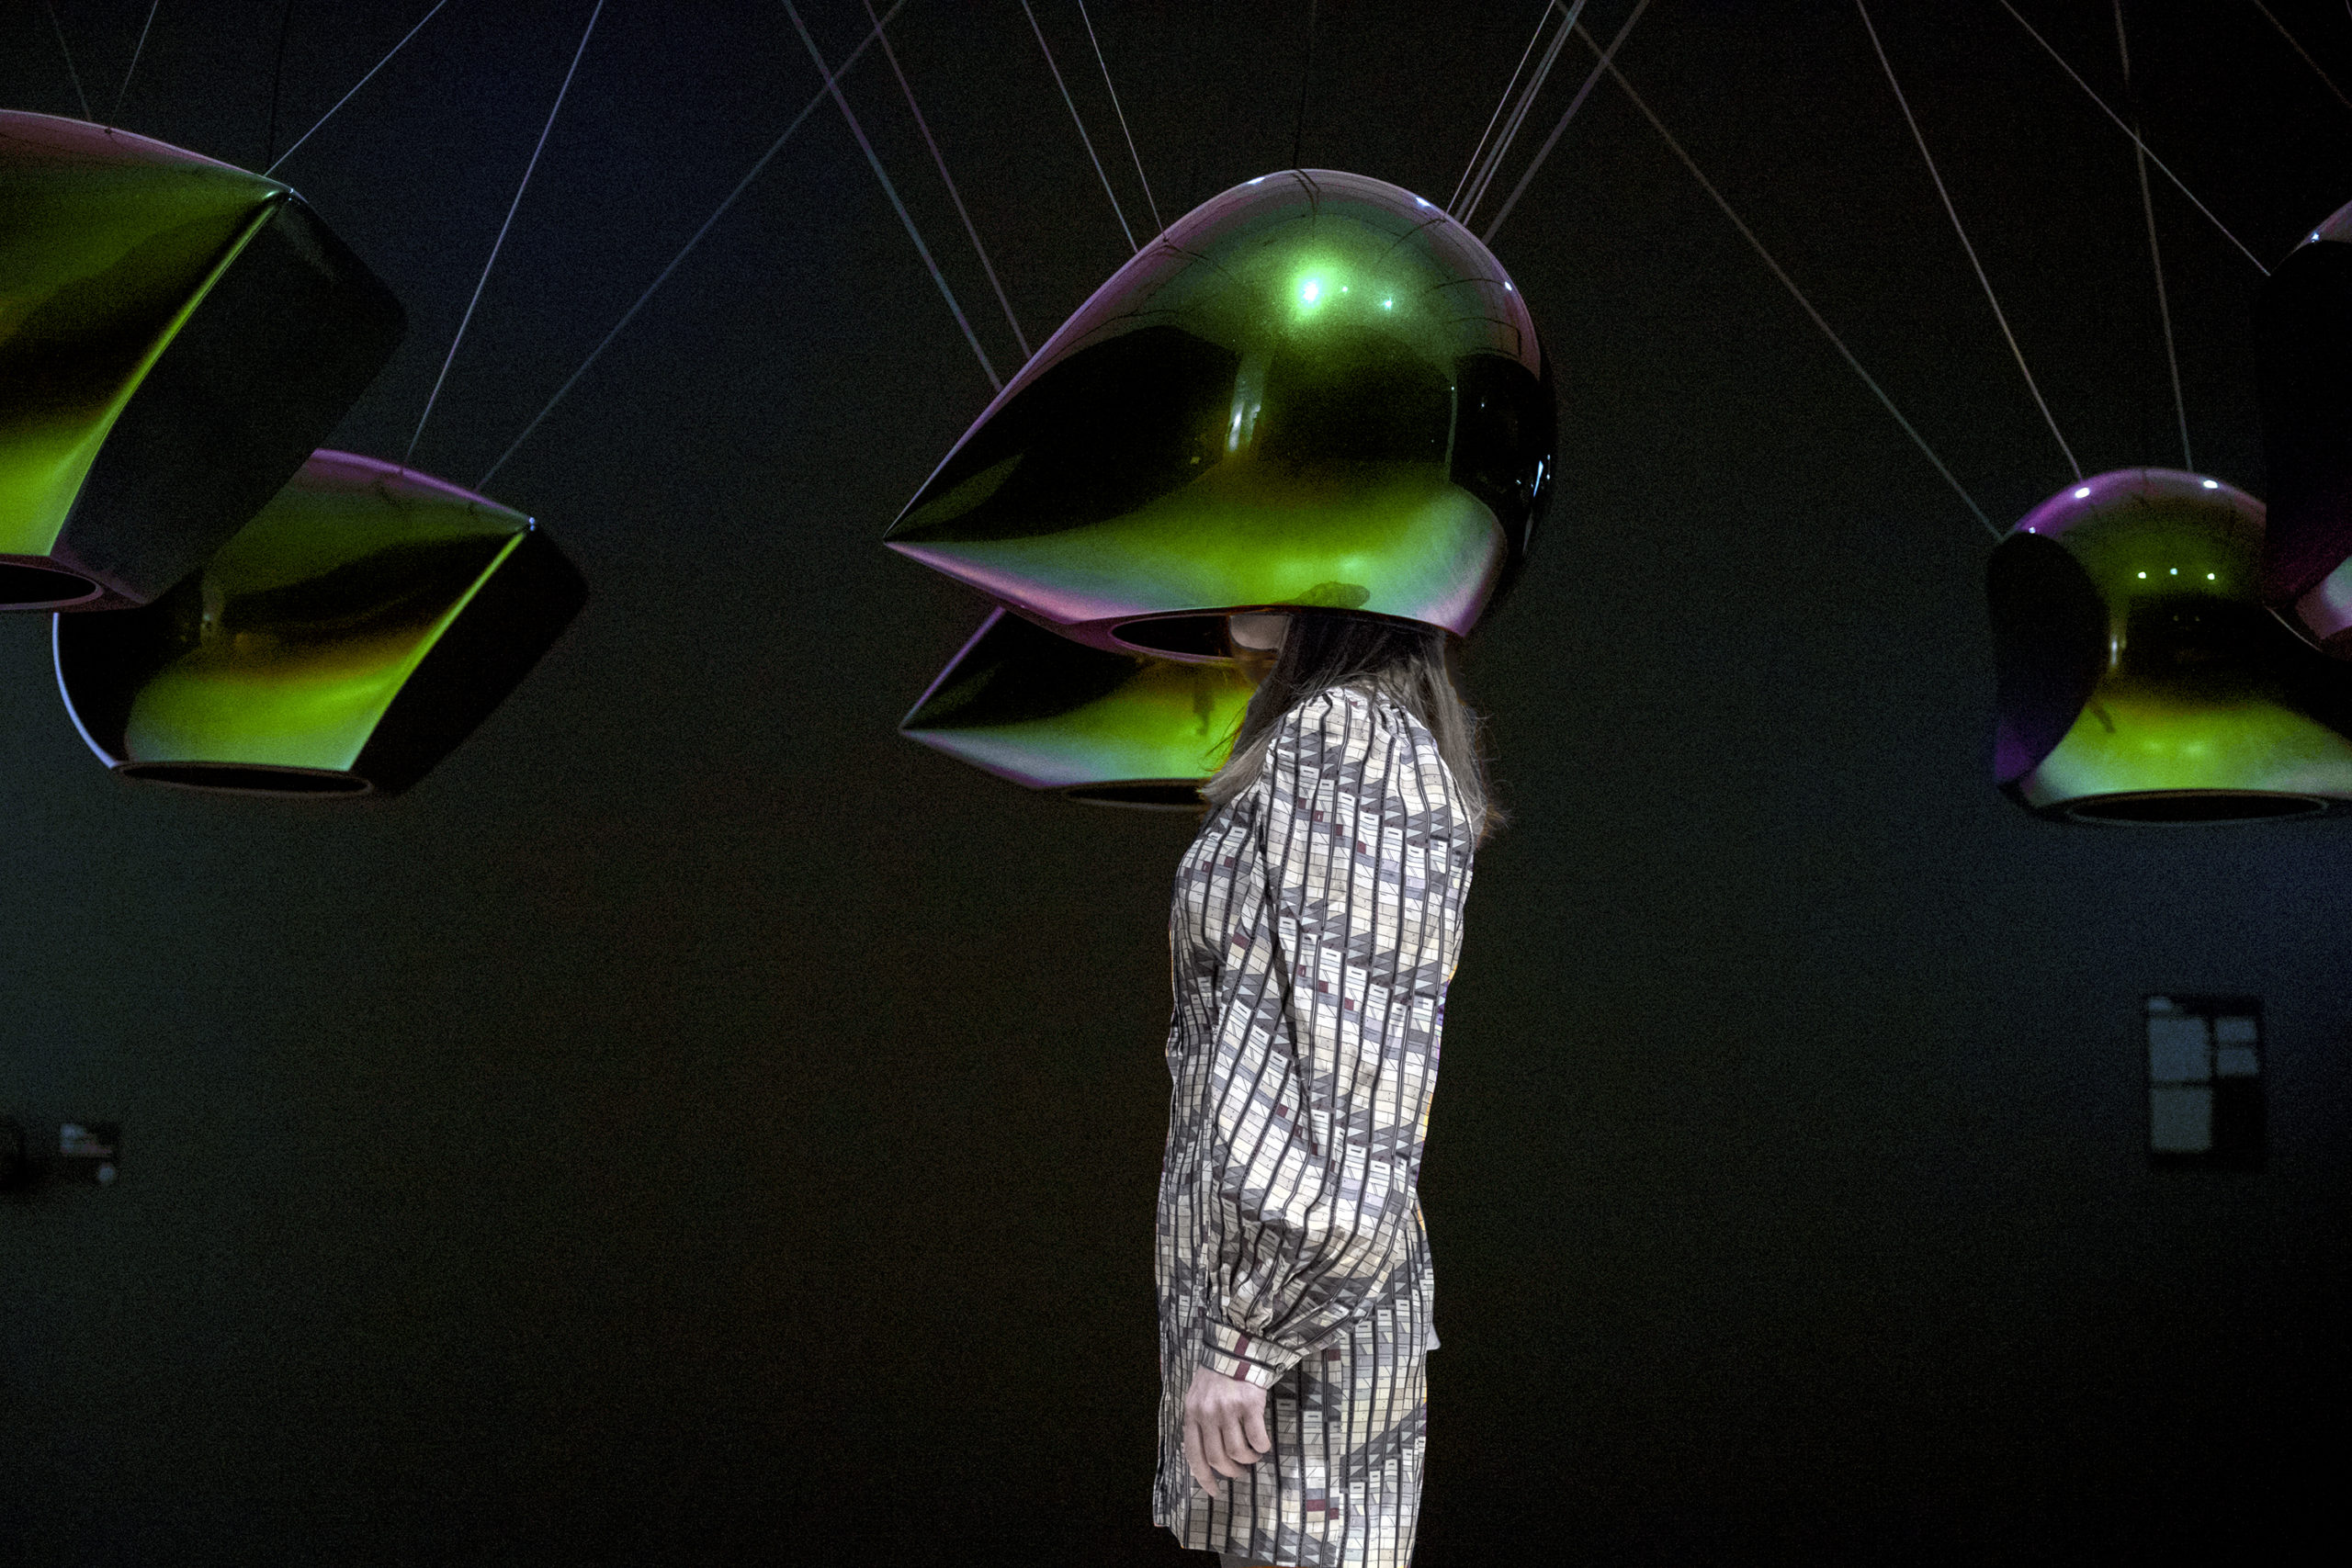 Semiosphere_Ludwig_Zics_2020